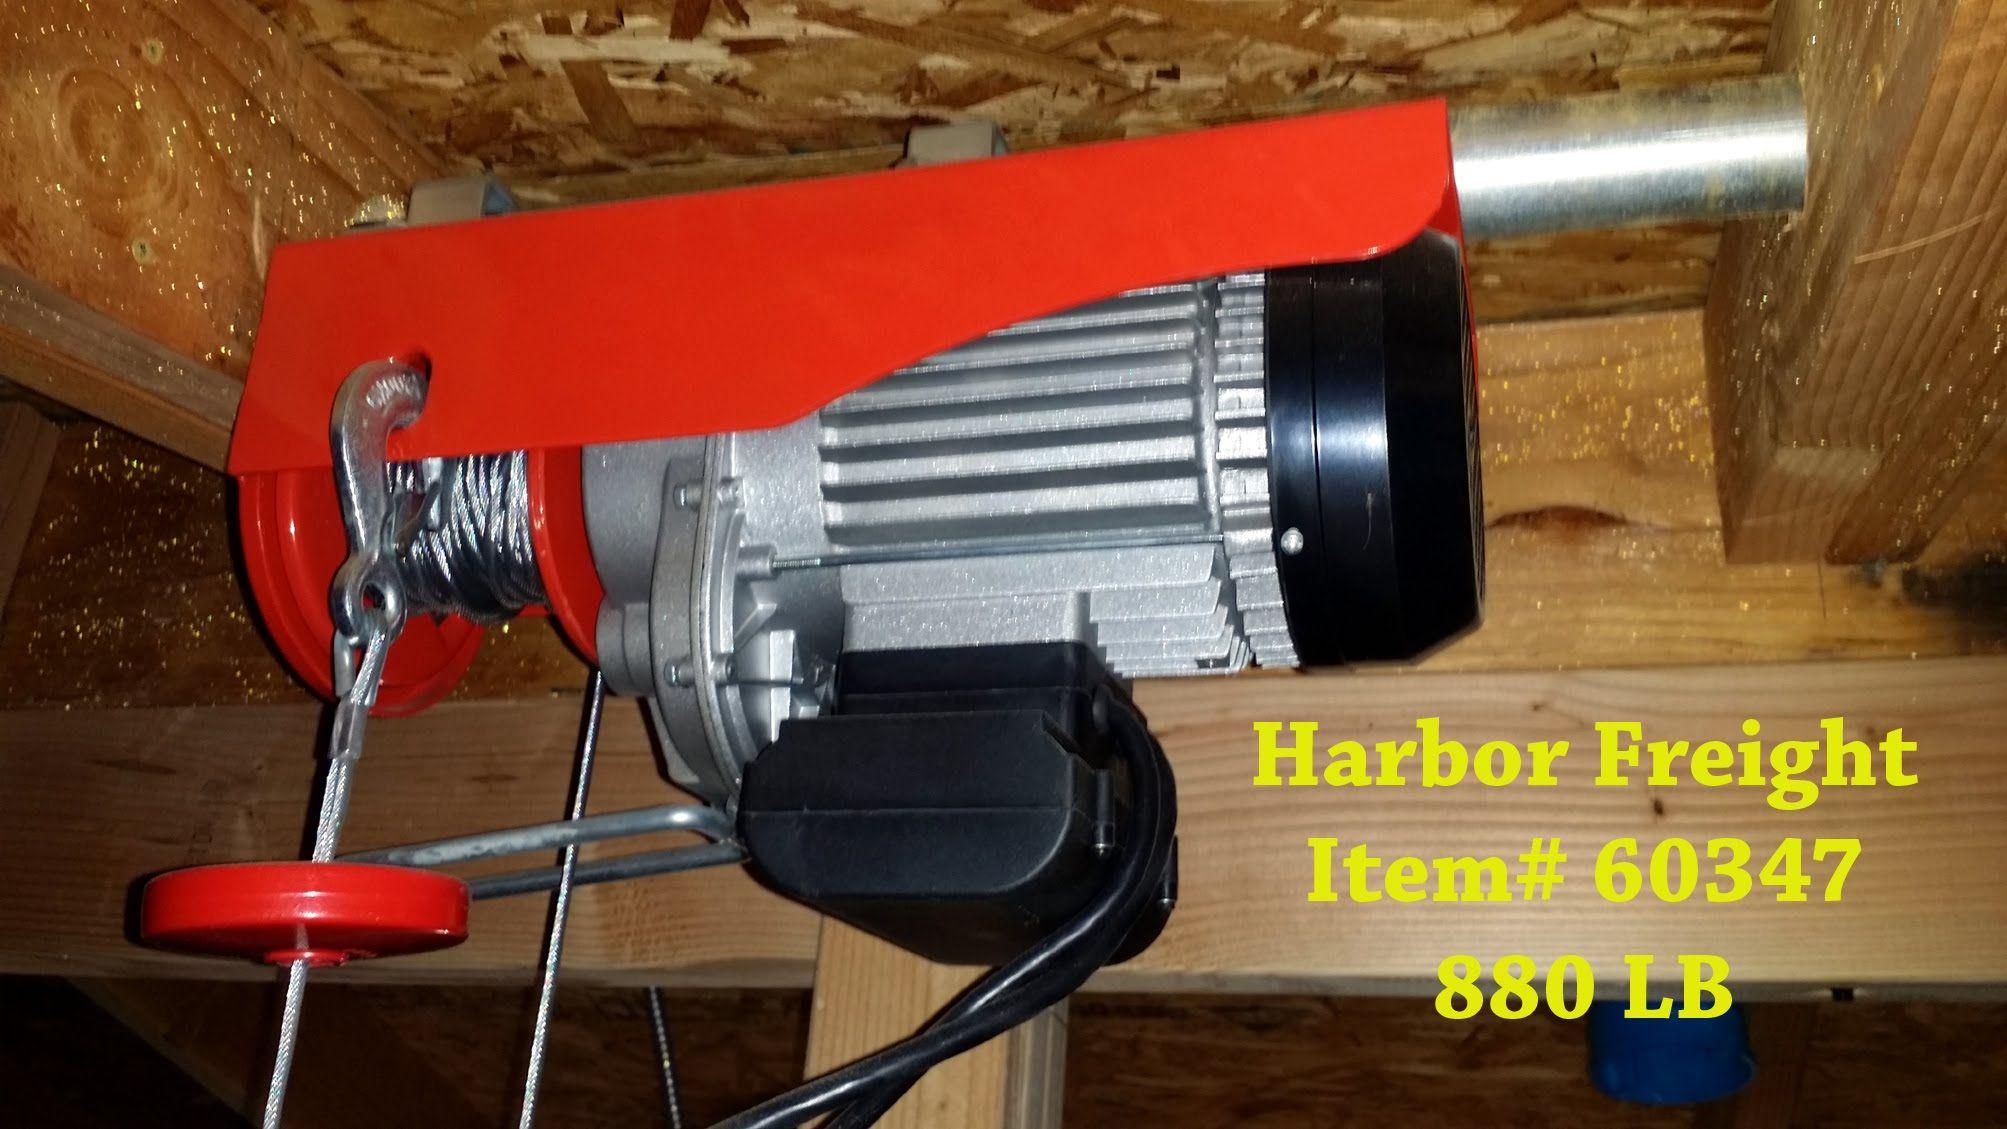 harbor freight 60347 880 lb winch [ 2007 x 1129 Pixel ]